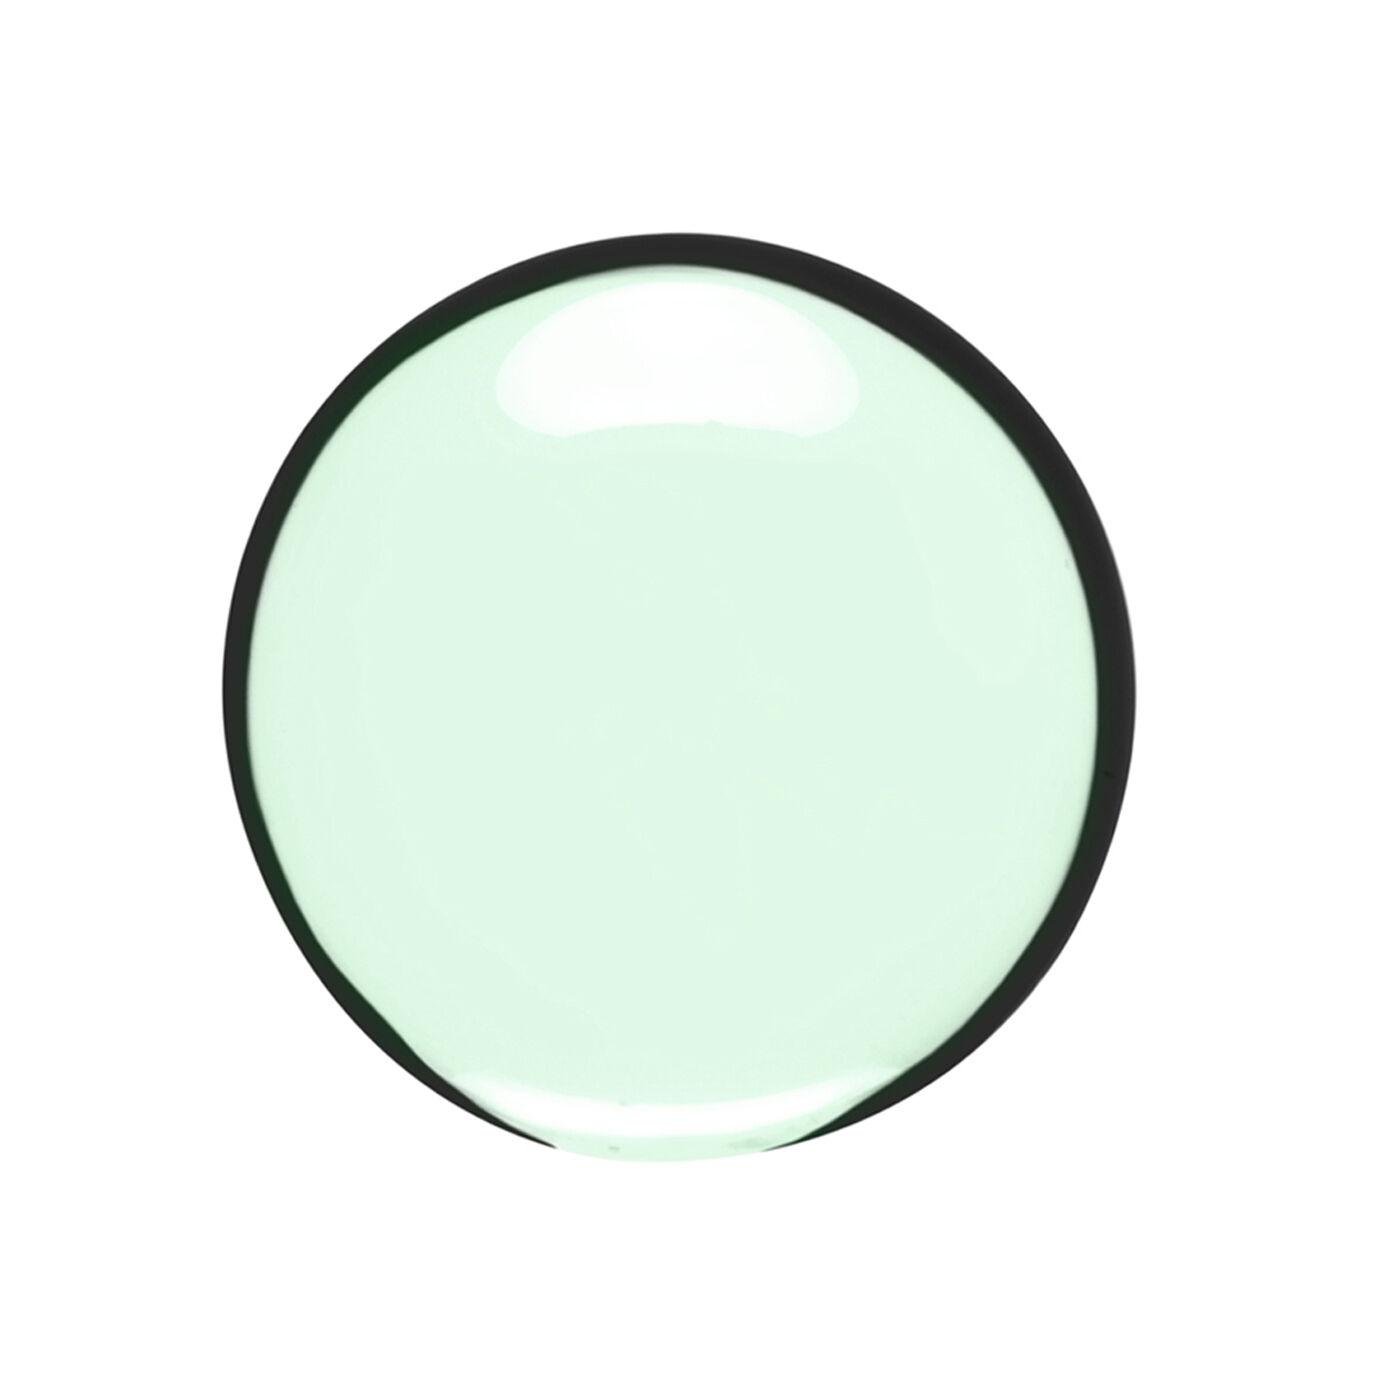 XL-Reinigungslotion Tonique Iris - Mischhaut/ölige Haut 400 ml